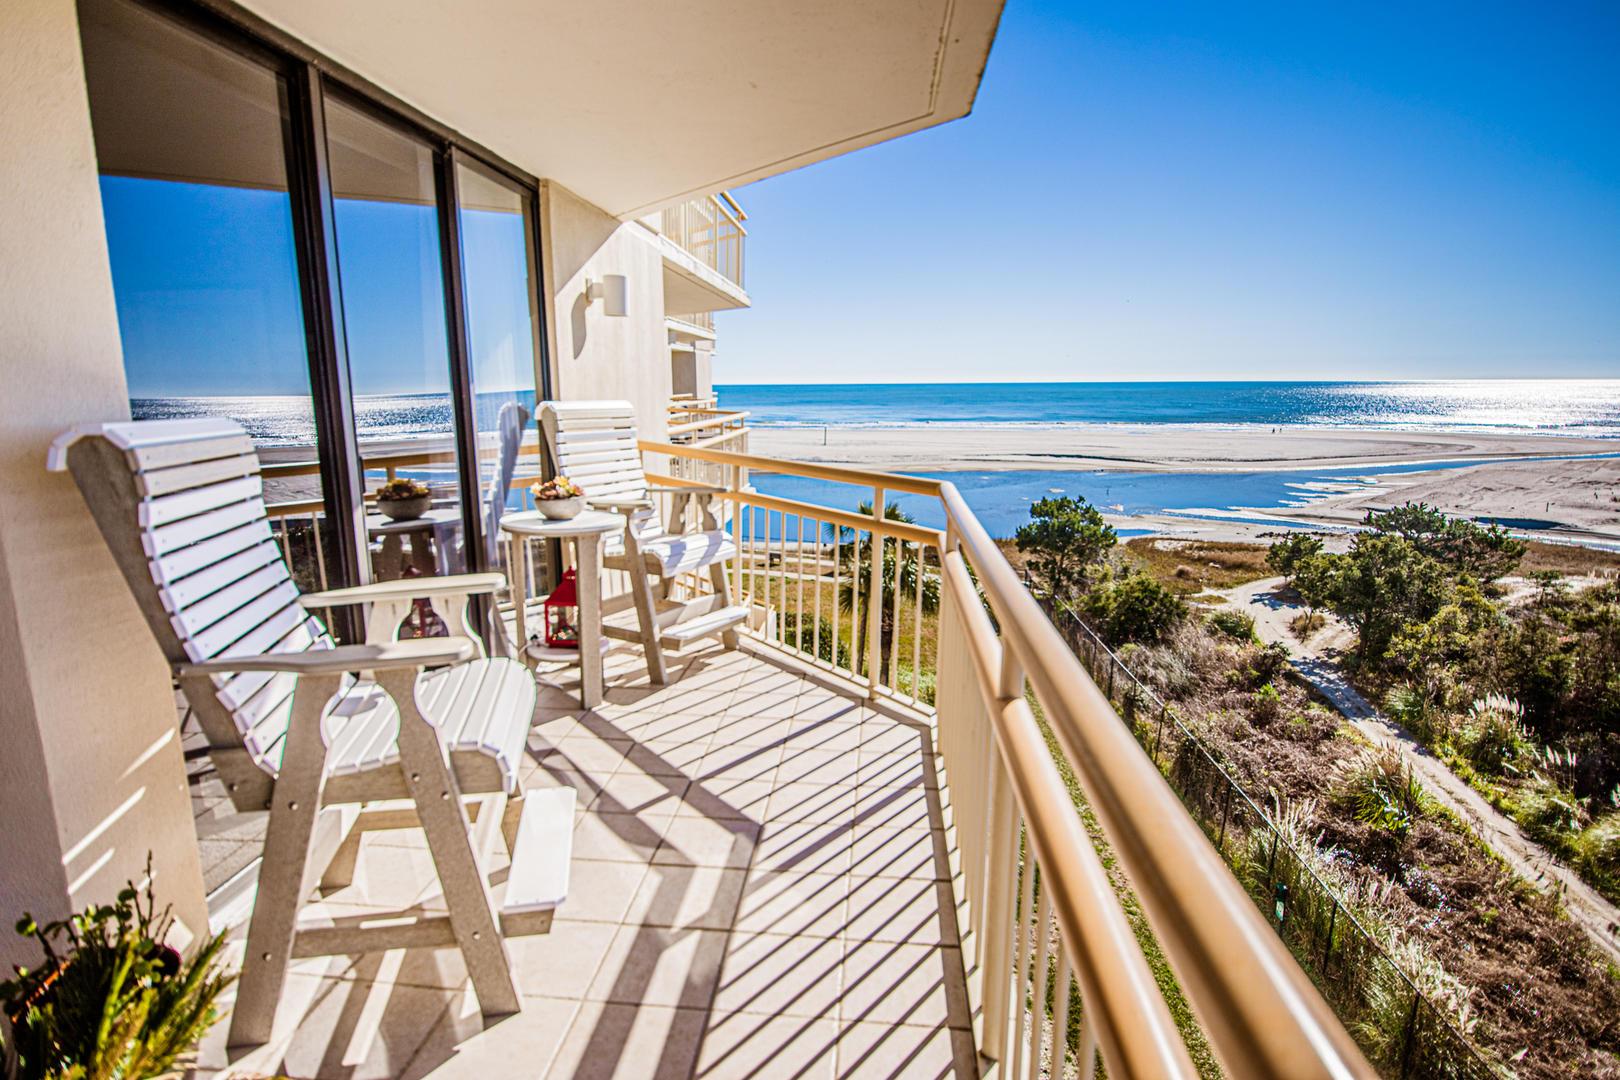 Ocean Creek PP4 - Private Balcony